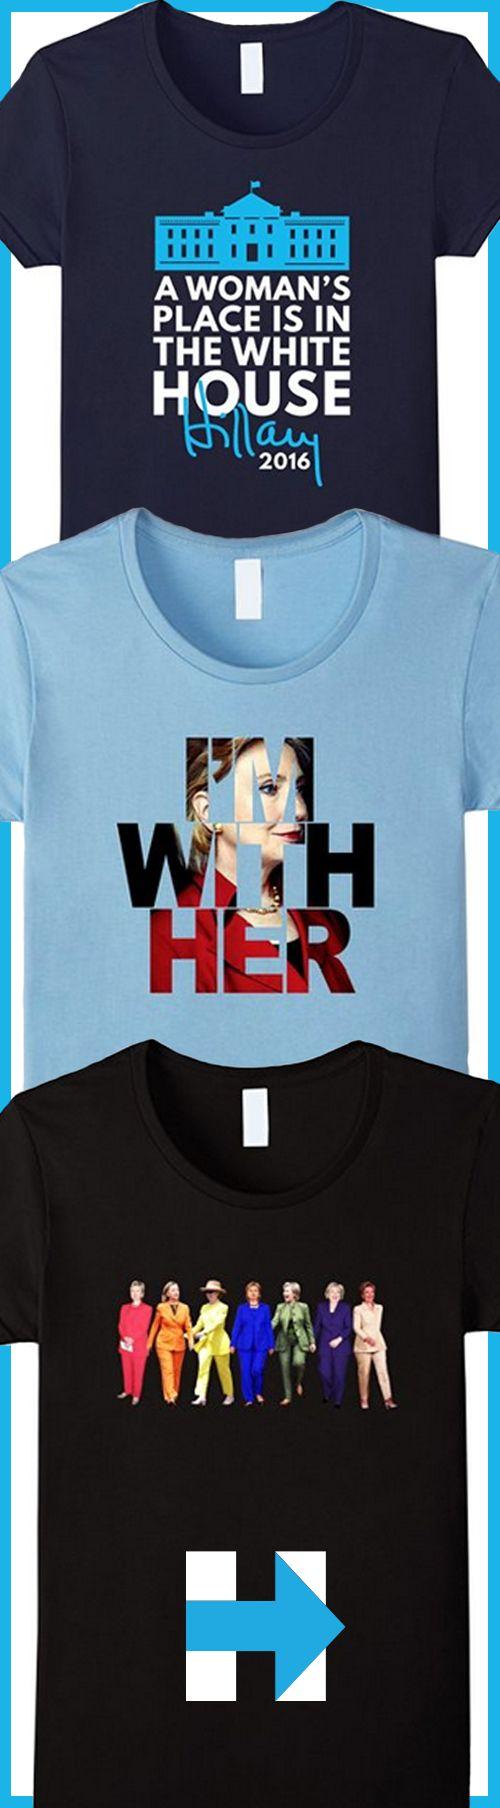 hillary clinton for president, hillary 2016, hillary clinton shirts